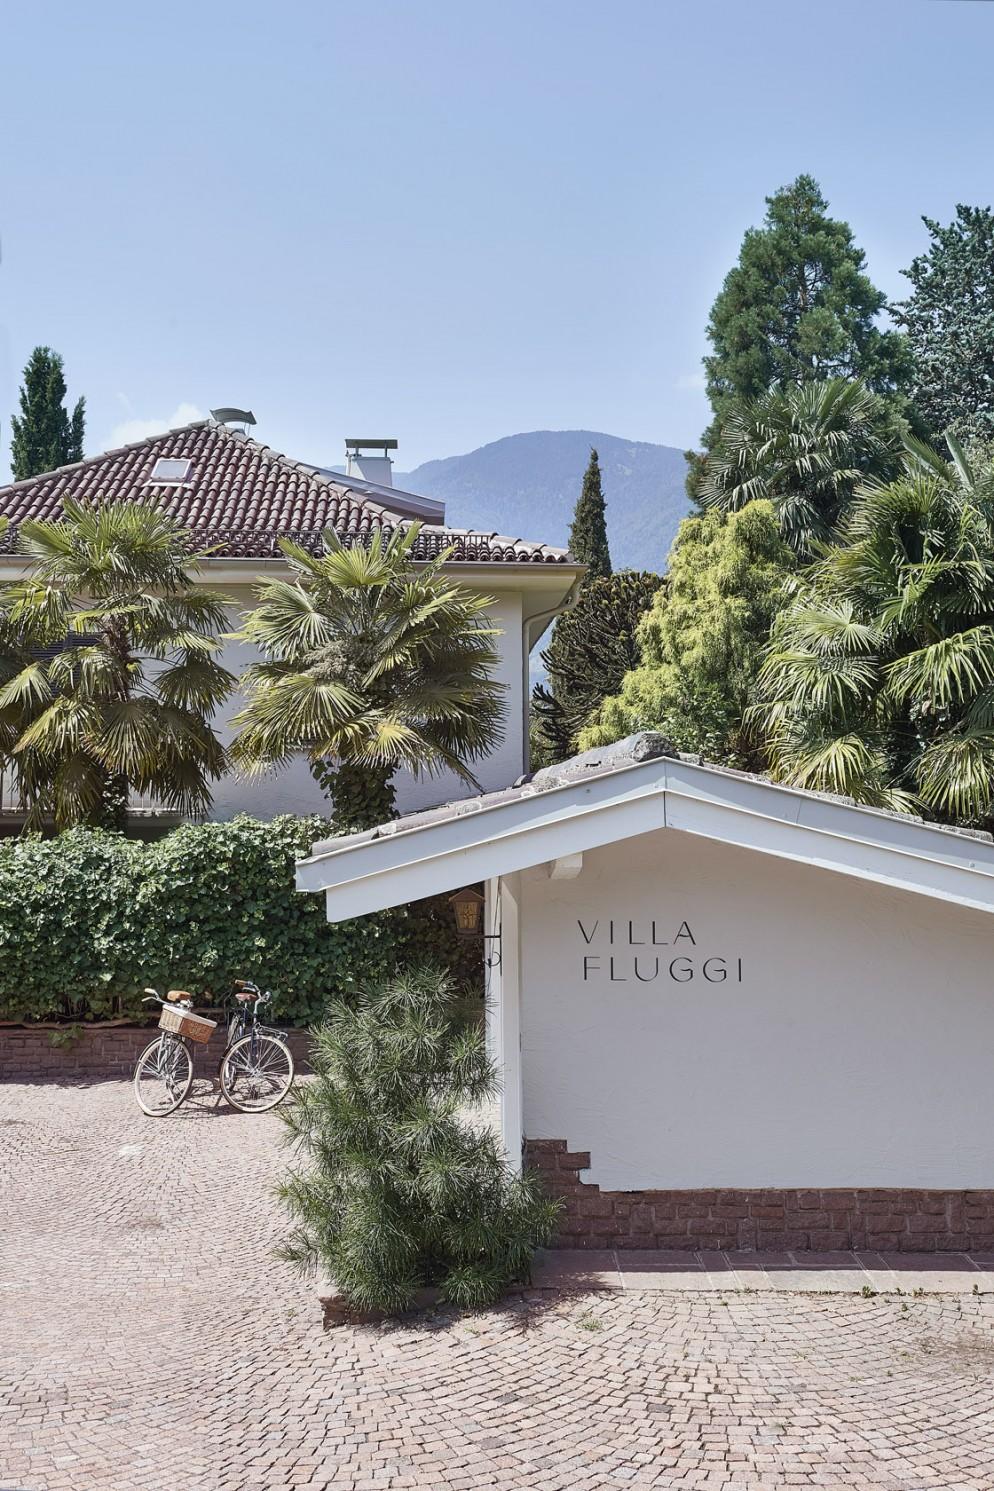 villa-fiuggi-merano-tyler-brûlé-architetto-Valtingojer03